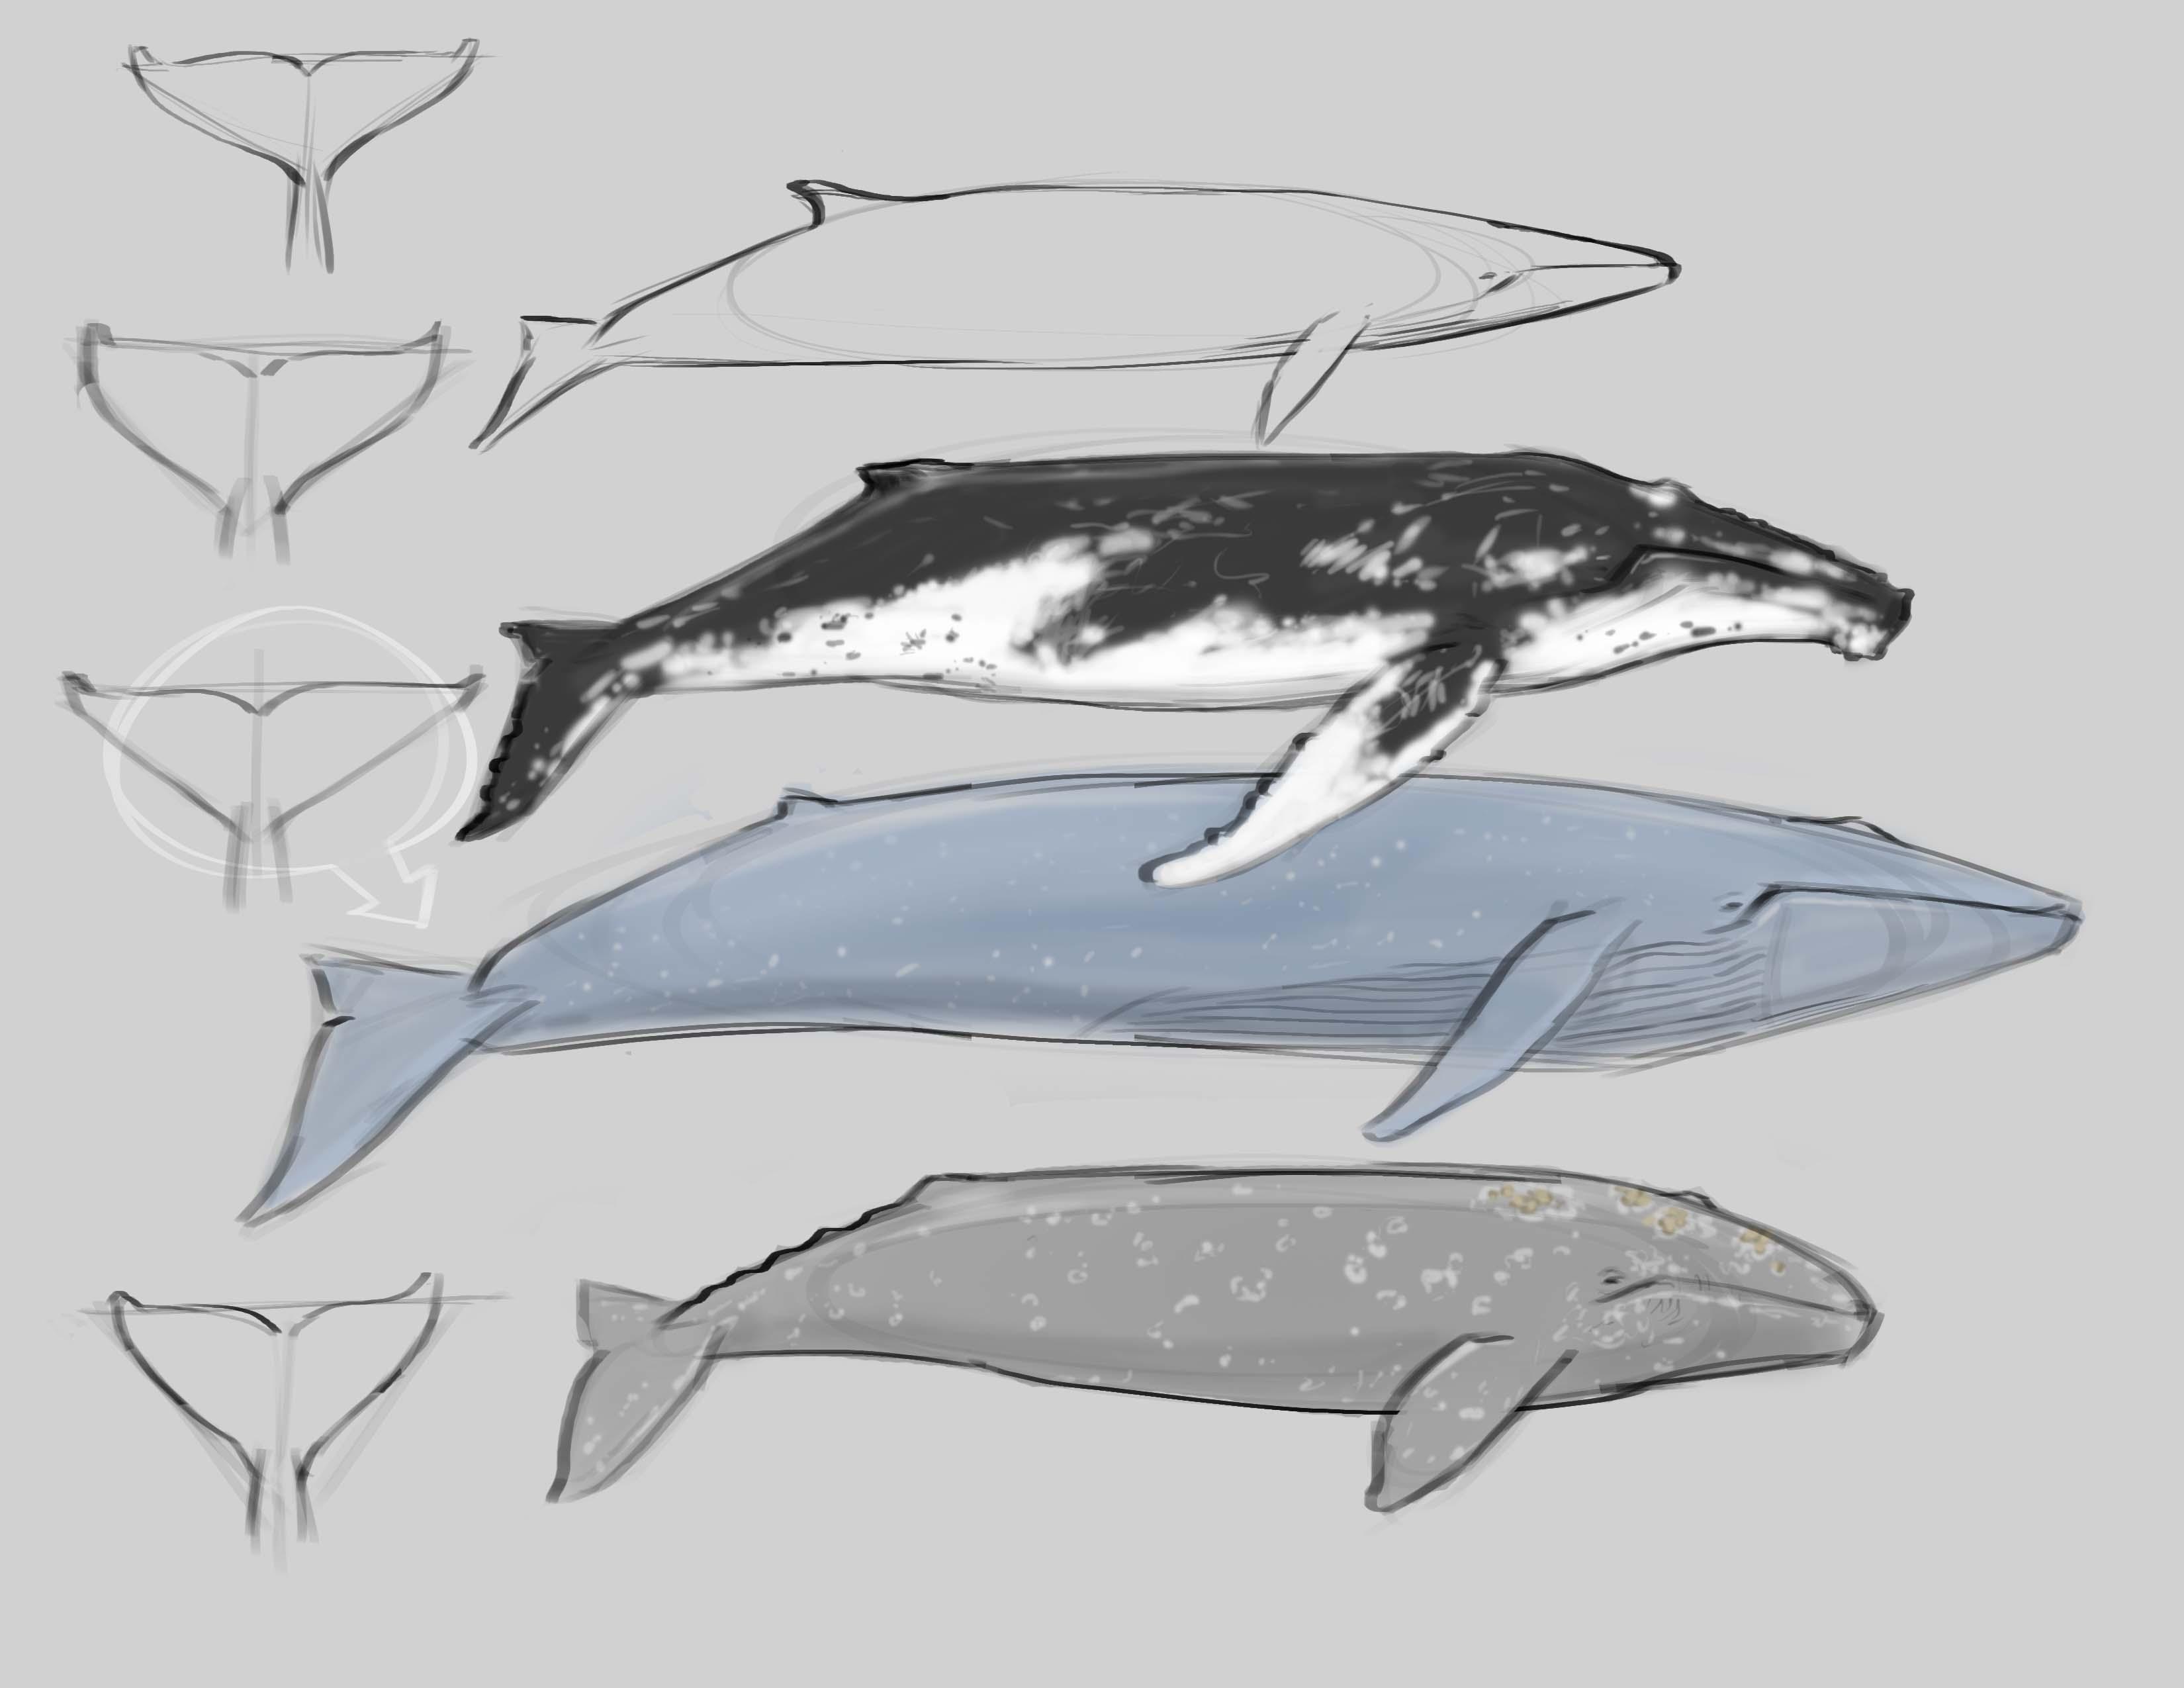 Whale Anatomy 1.13 - John Muir Laws